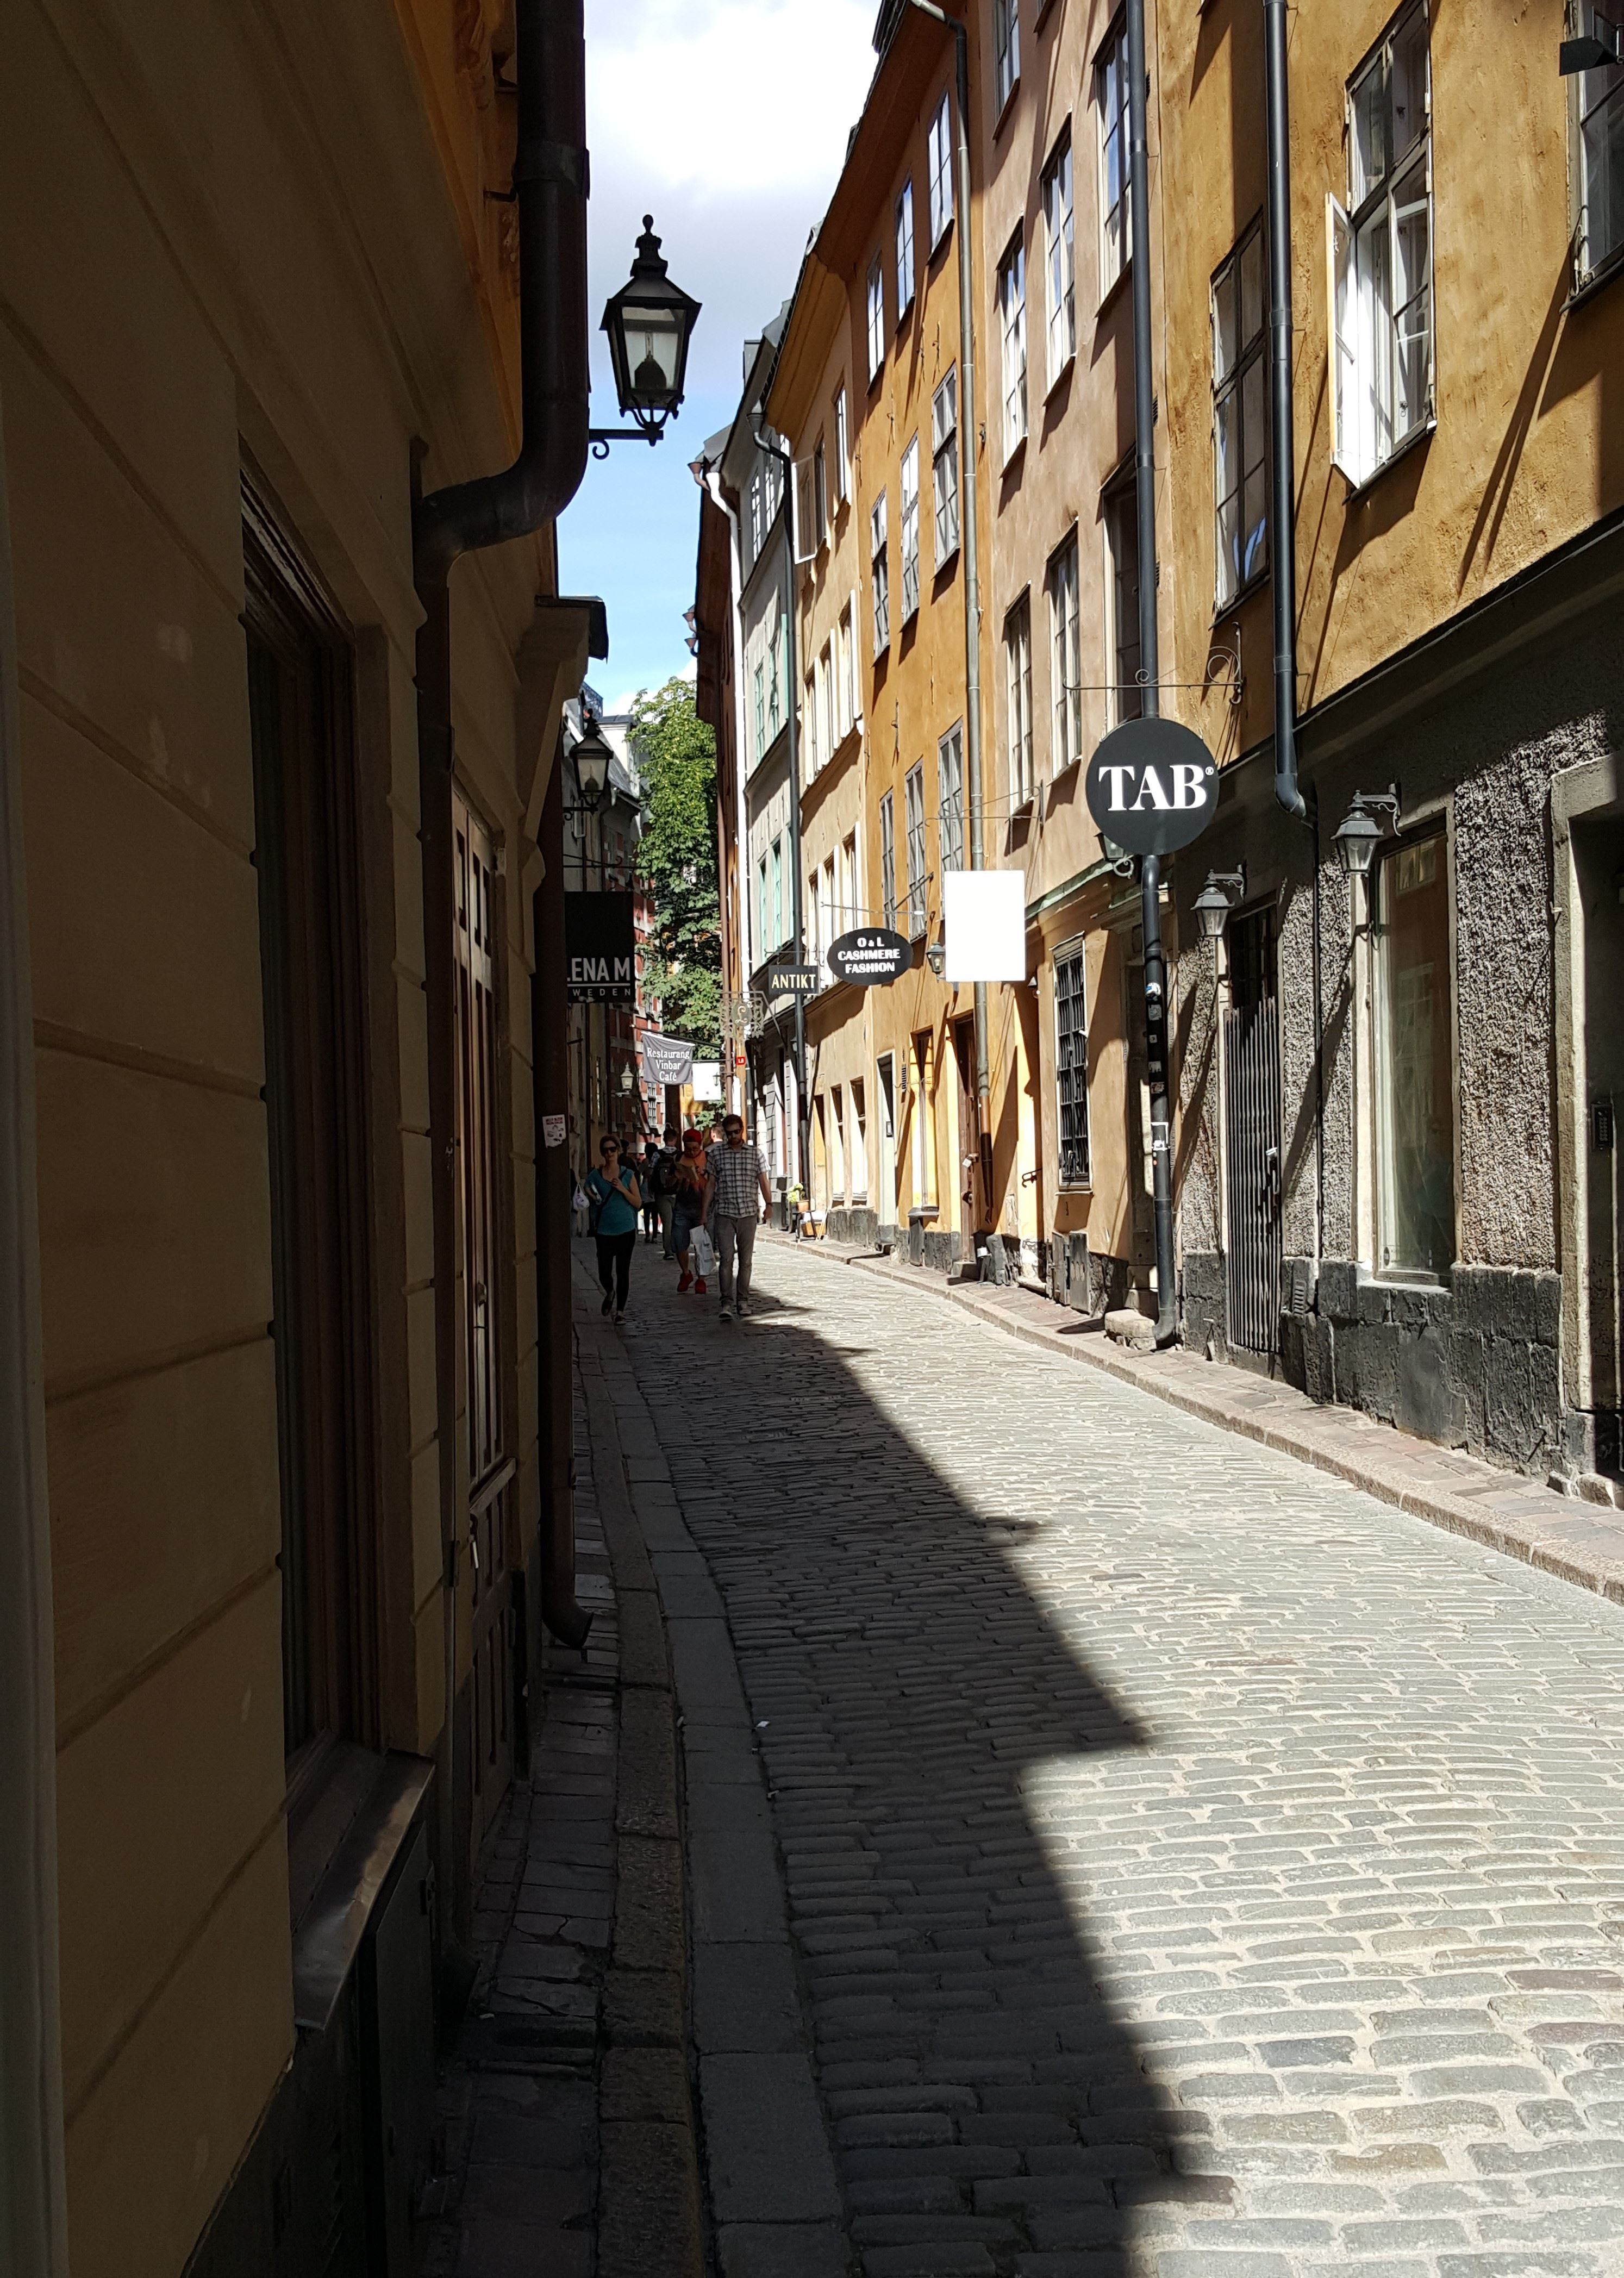 Stadsvandring i Gamla stan, Stadsvandringar i Stockholm